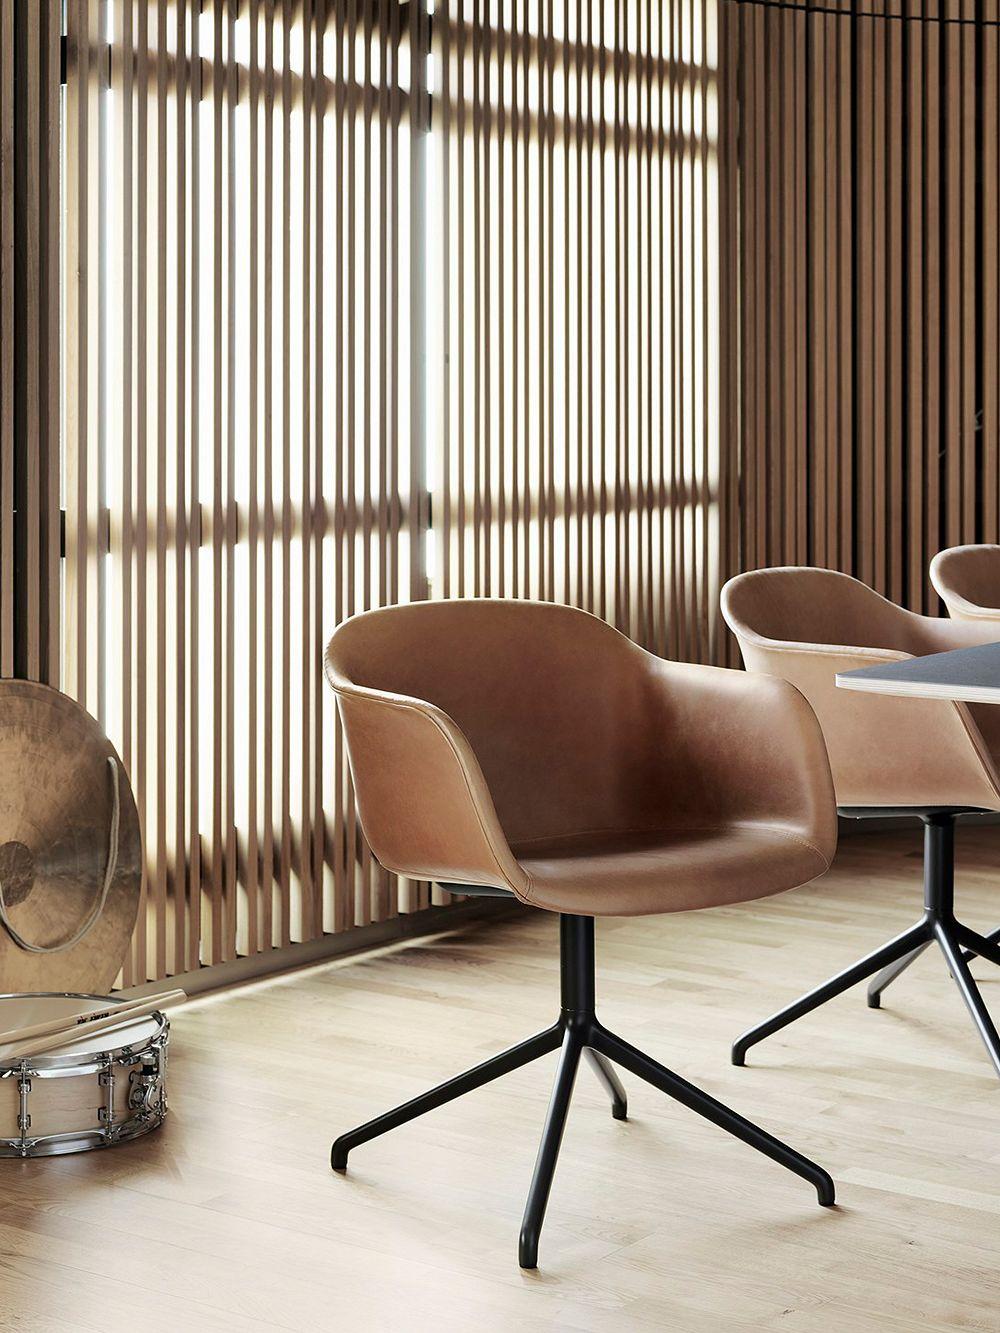 Muuto Fiber armchair, swivel base, cognac leather - black